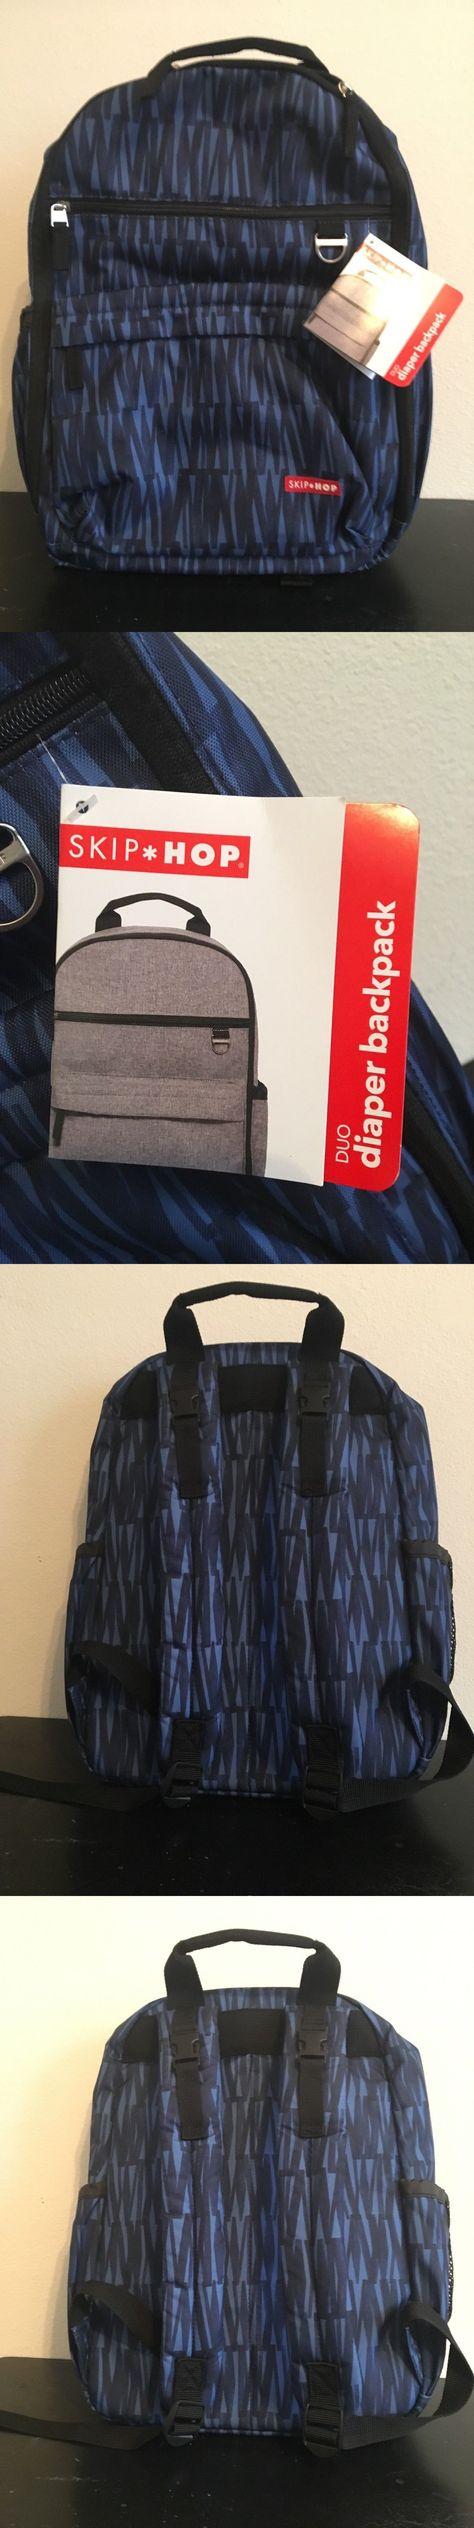 91936f63b8d Diaper Bags 146530  Skip Hop Duo Diaper Back Pack (Blue Graffiti) -  BUY IT  NOW ONLY   42 on eBay!